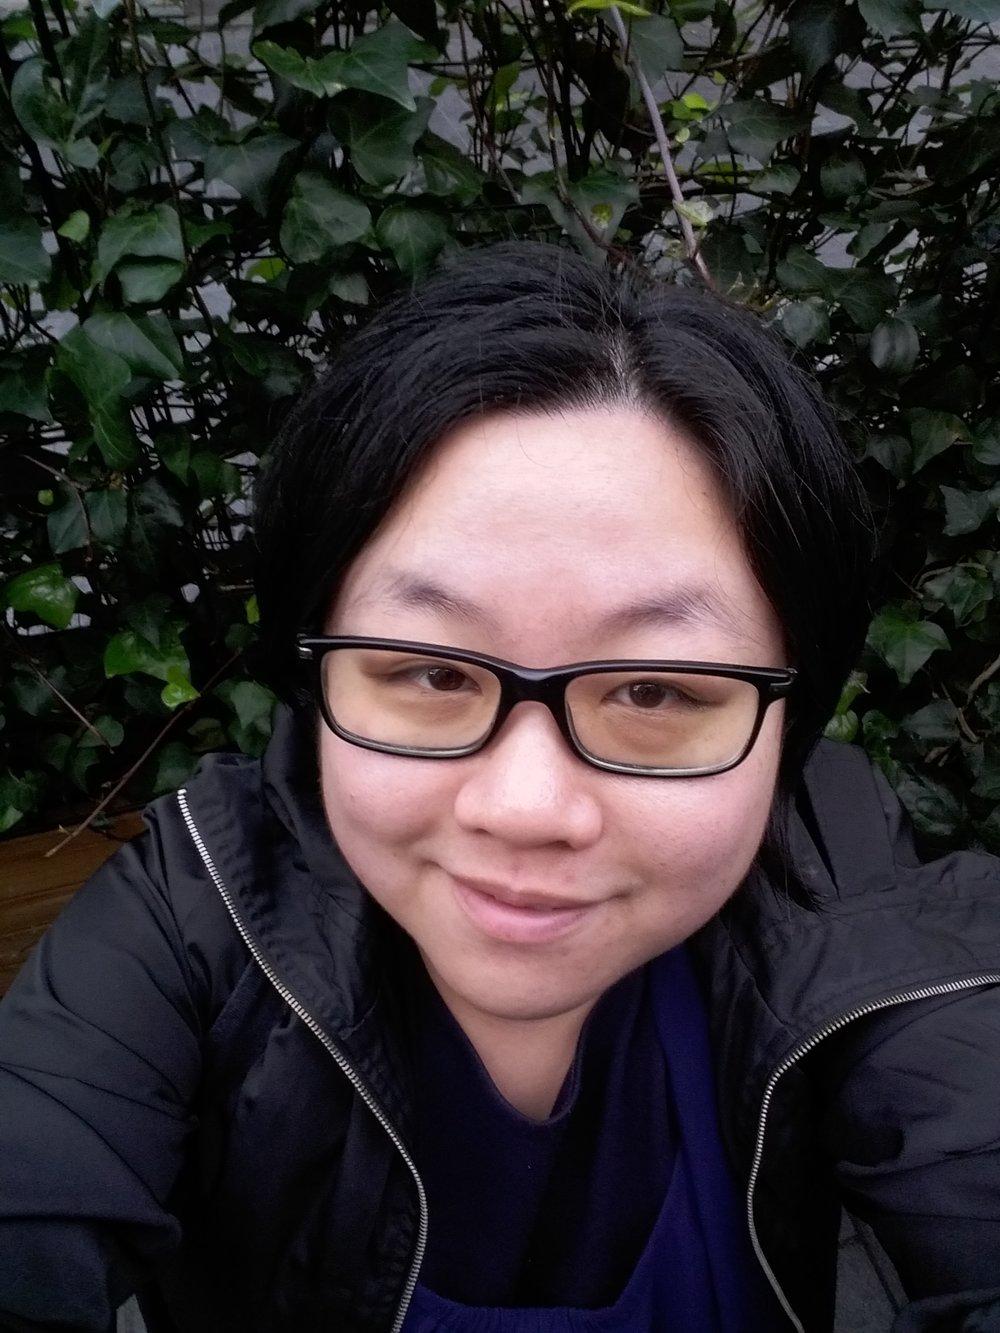 Jeanie Tseng - POLYVORE STYLIST /FASHION WEEK ASSISTANT